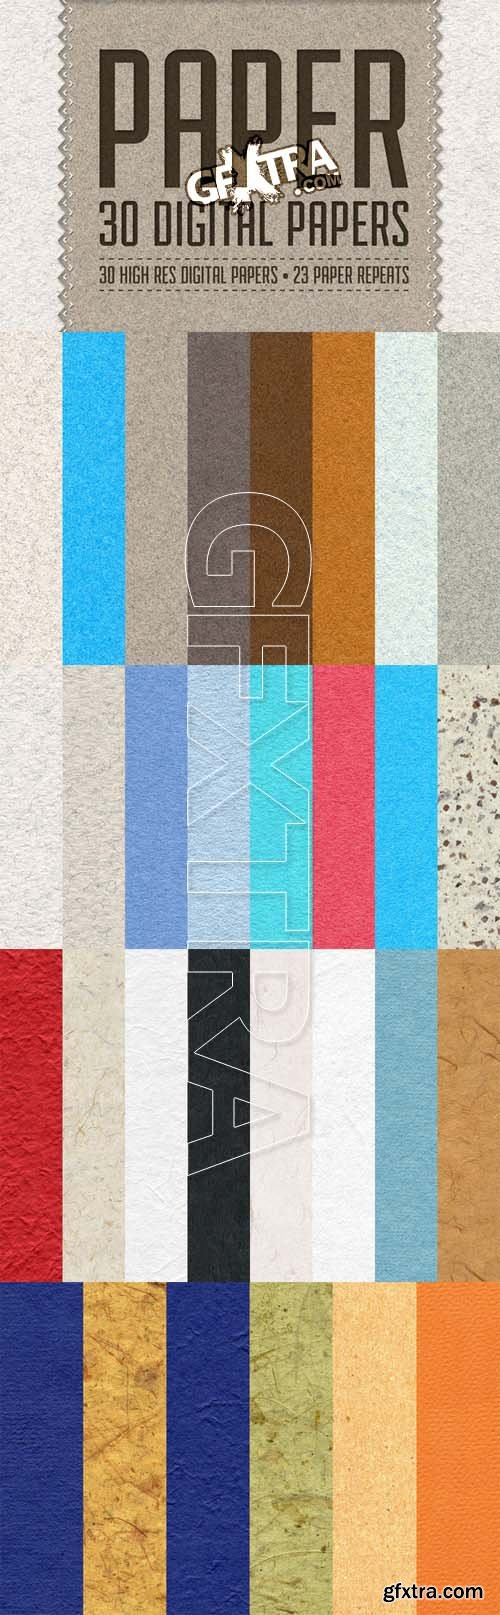 Paper Pack - 30 Digital Papers